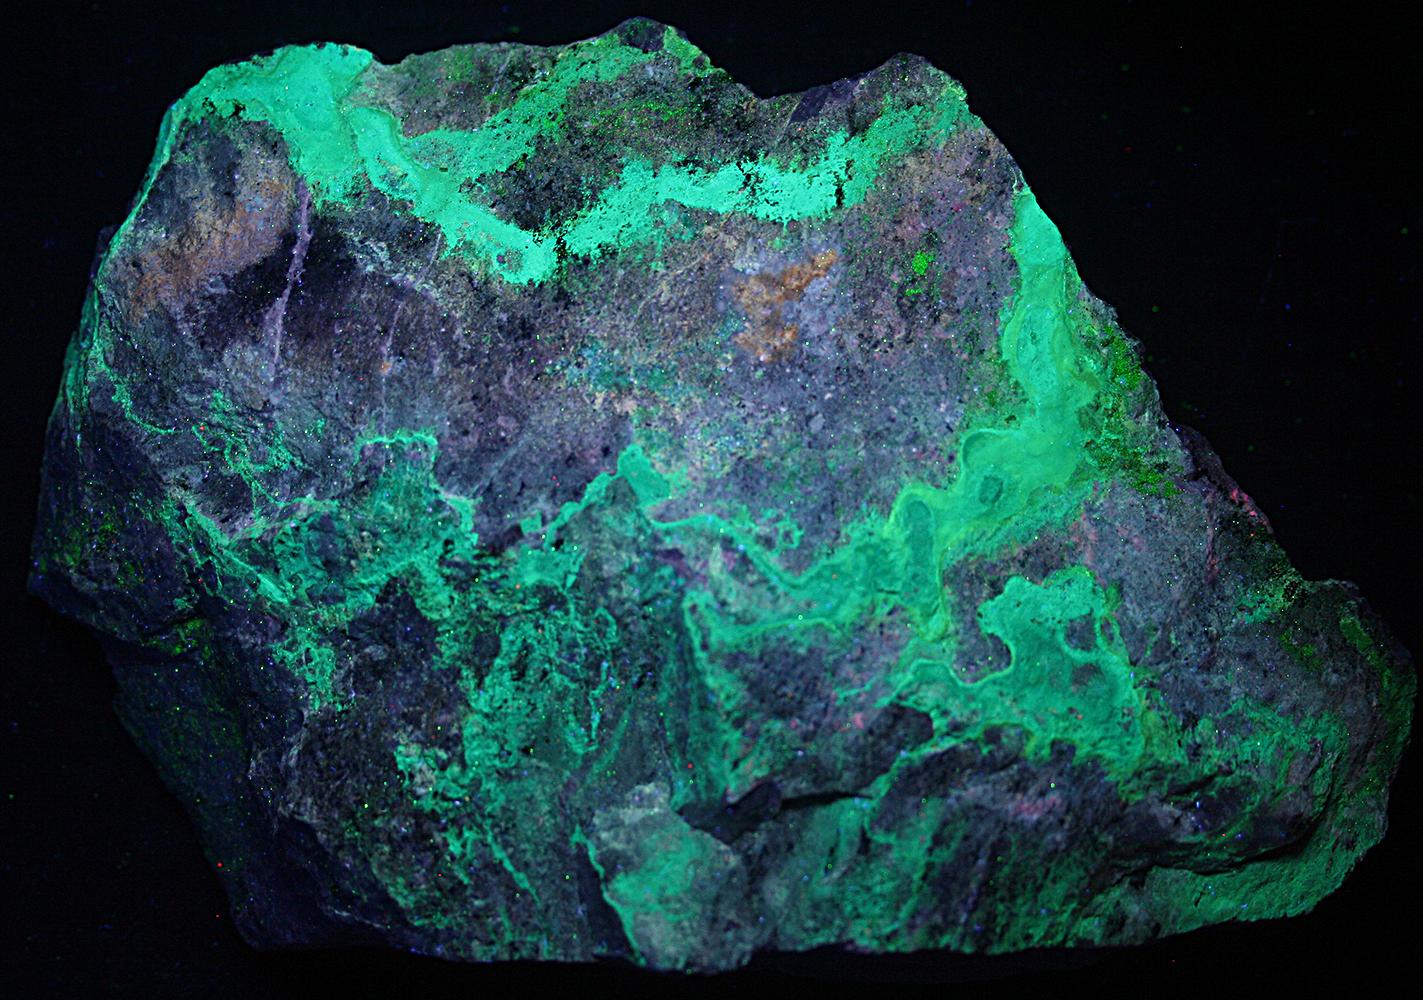 Znucalite coating on calcite from Sterling Hill Mine North ore body, Ogdensburg, NJ under shortwave UV Light